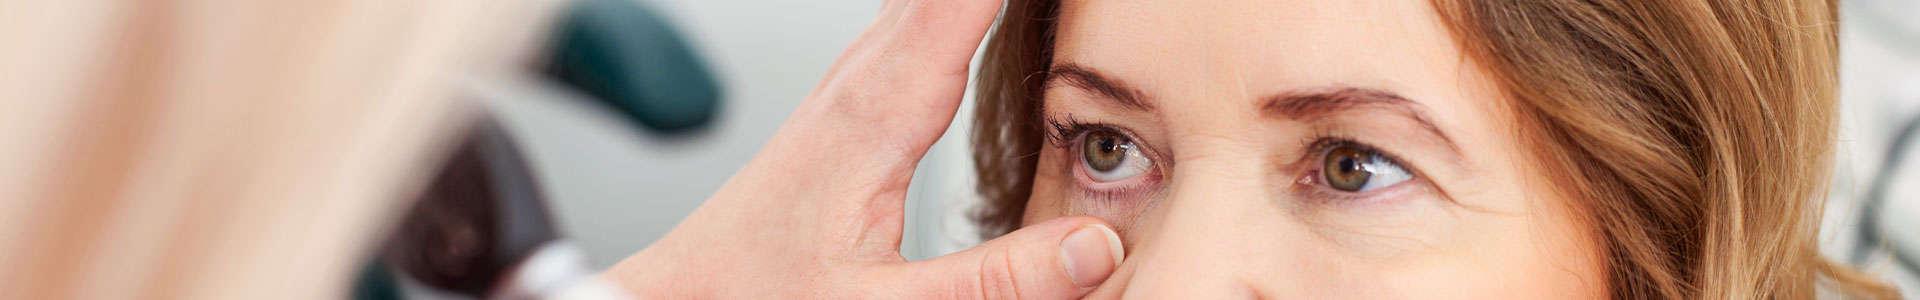 intervento-glaucoma